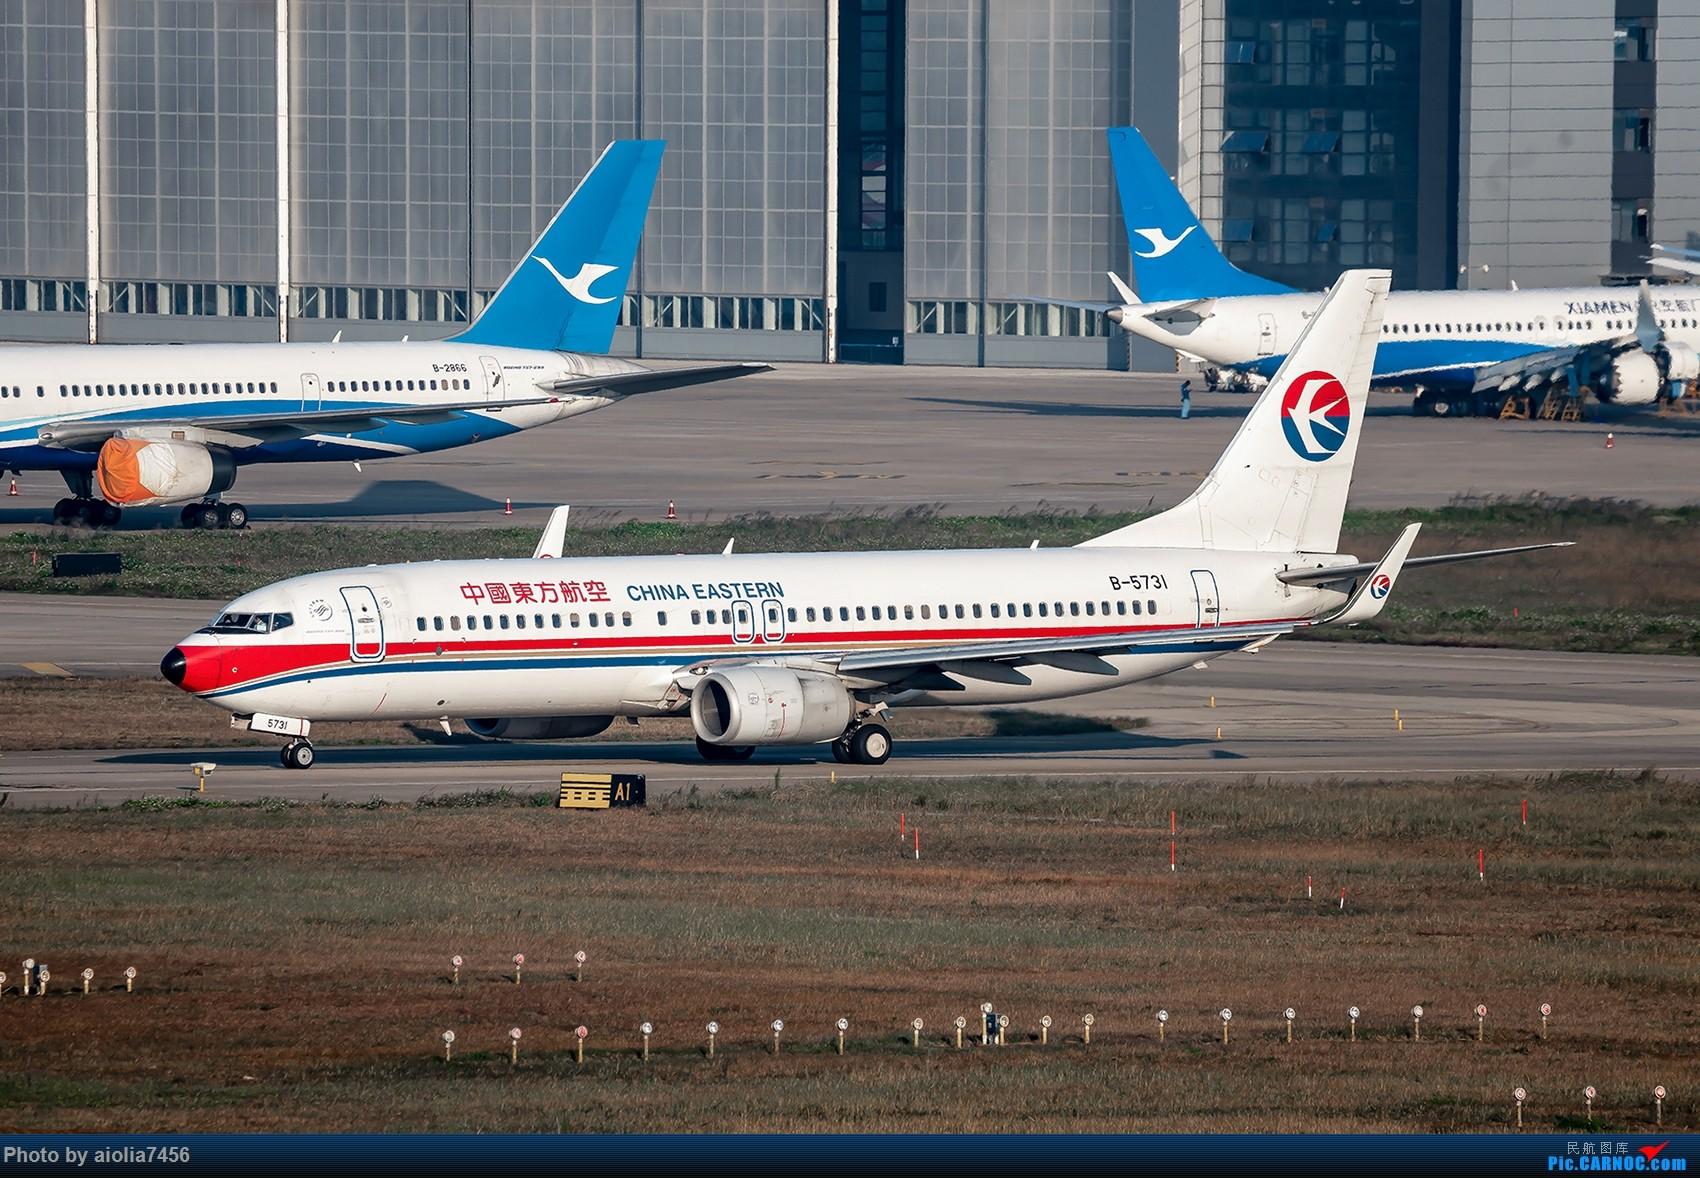 Re:[原创]【福州飞友会】【合肥飞友会】最最难忘的FOC的那一抹蓝 BOEING 737-800 B-5731 中国福州长乐国际机场